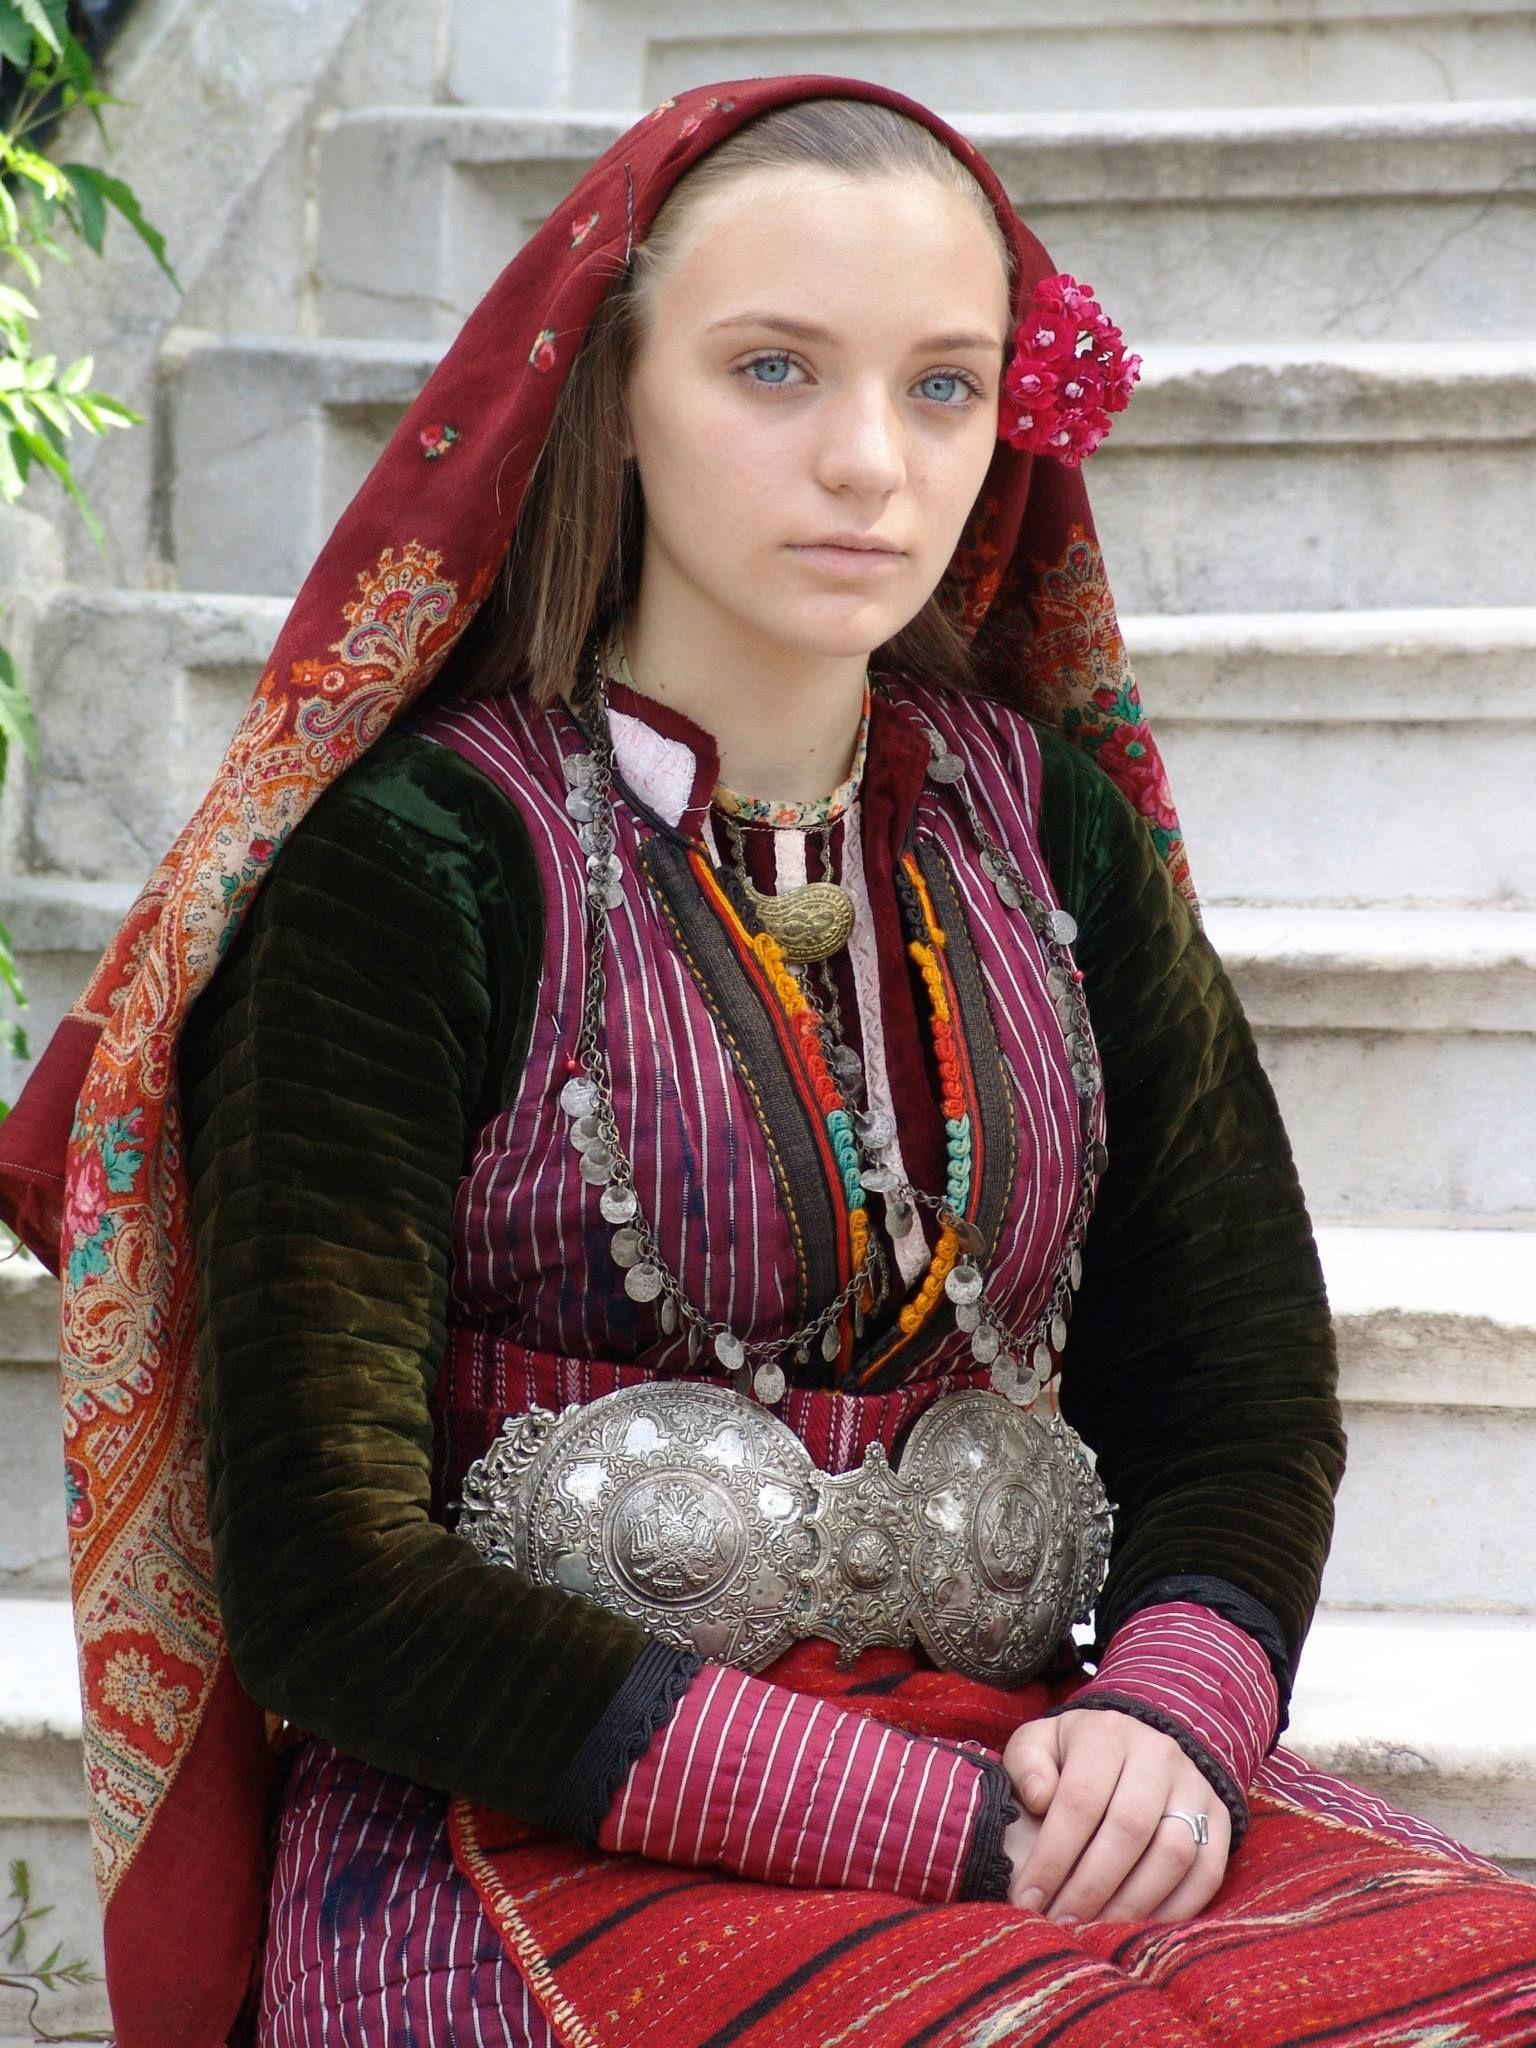 Bulgarian girl in traditional dress [1536 2048]   Human ...